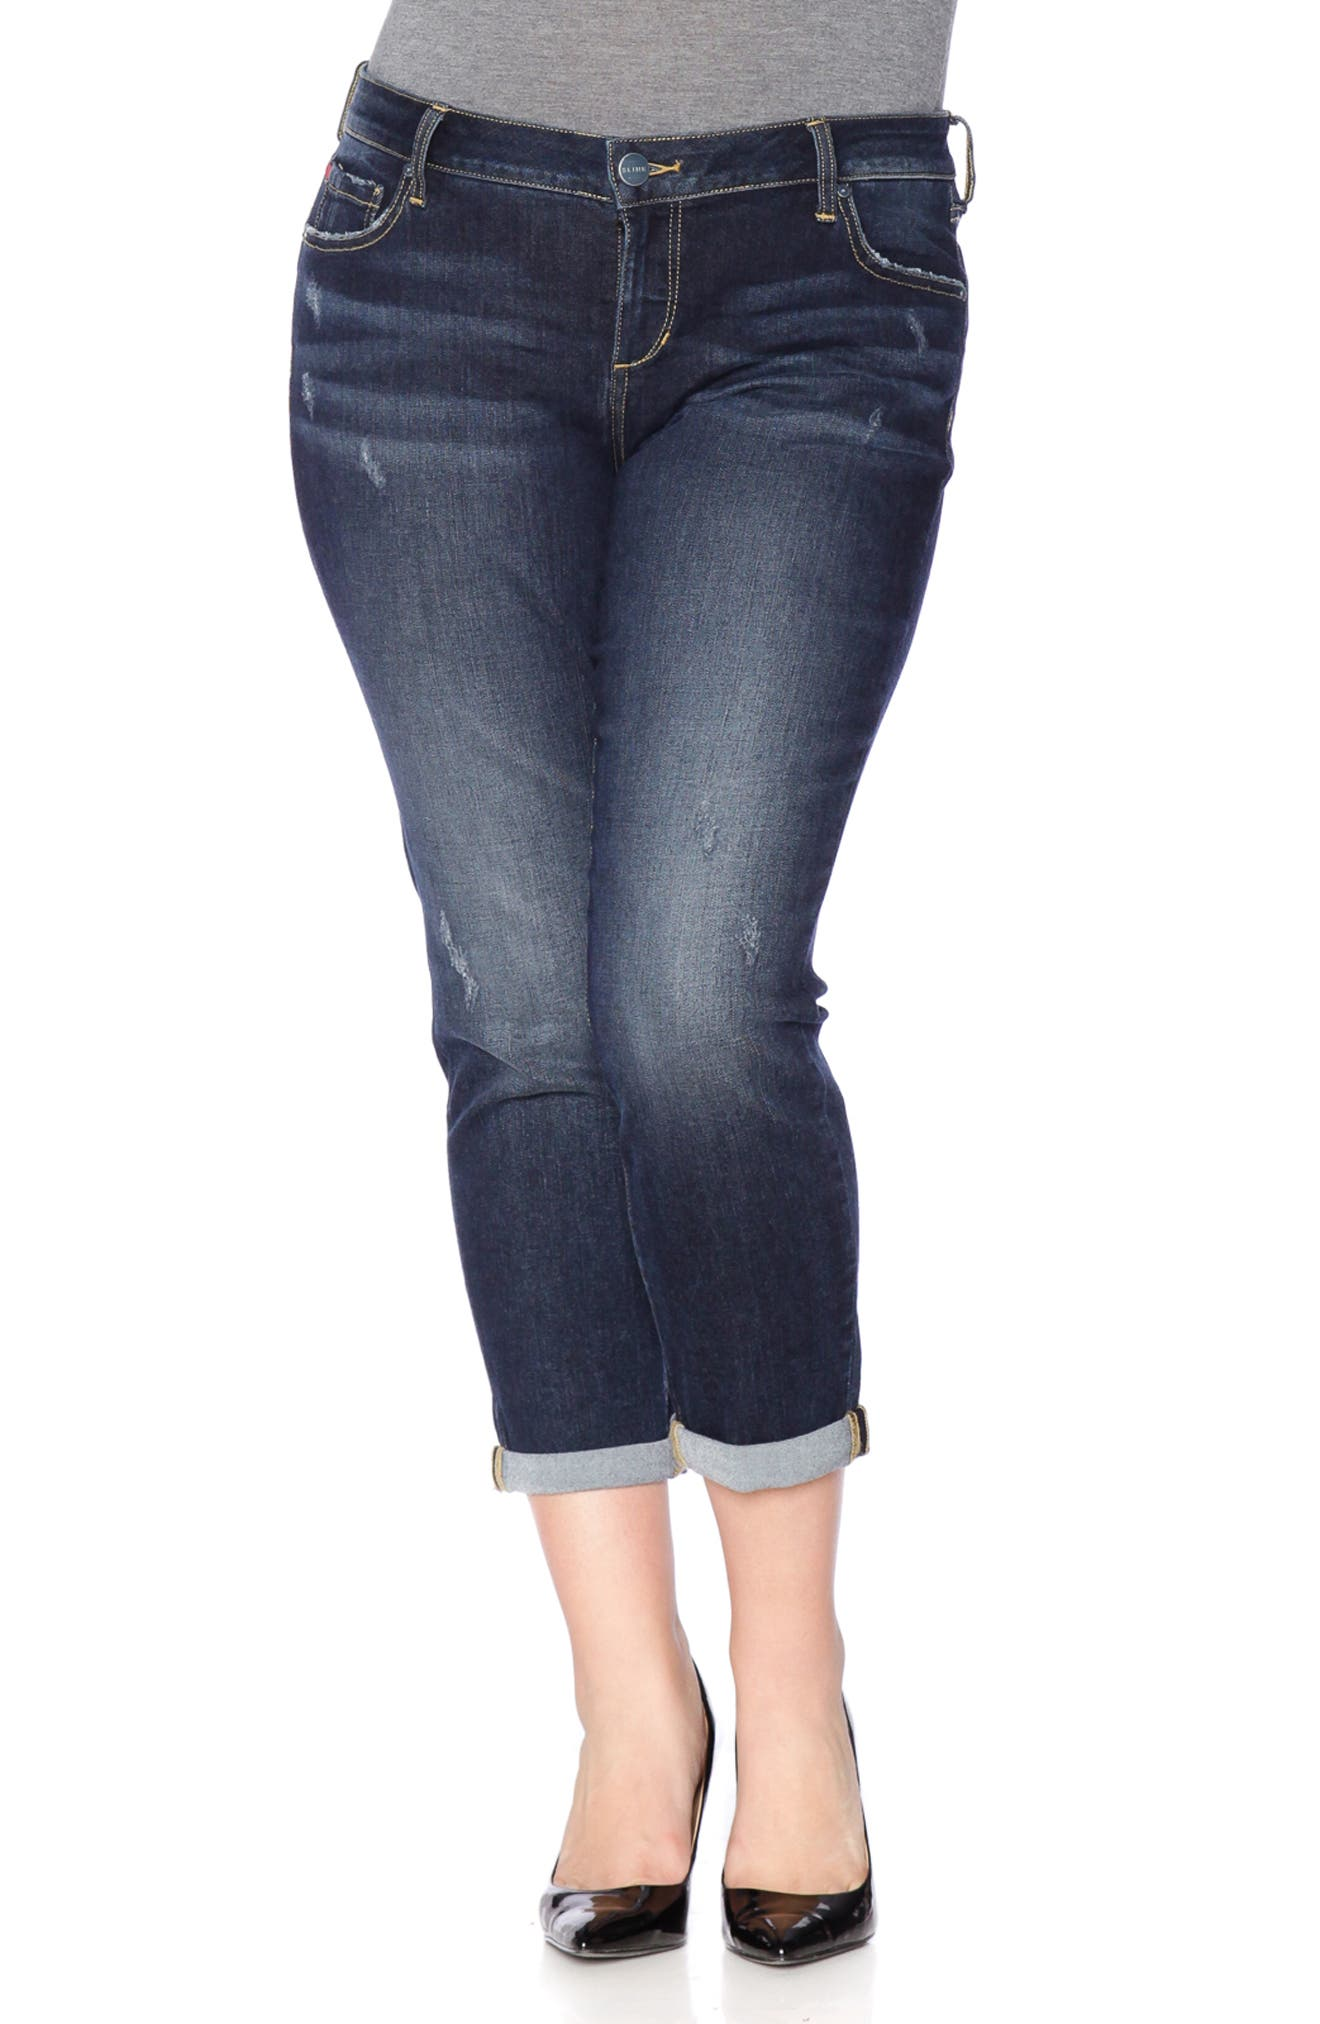 SLINK JEANS Stretch Ankle Boyfriend Jeans, Main, color, BELLA